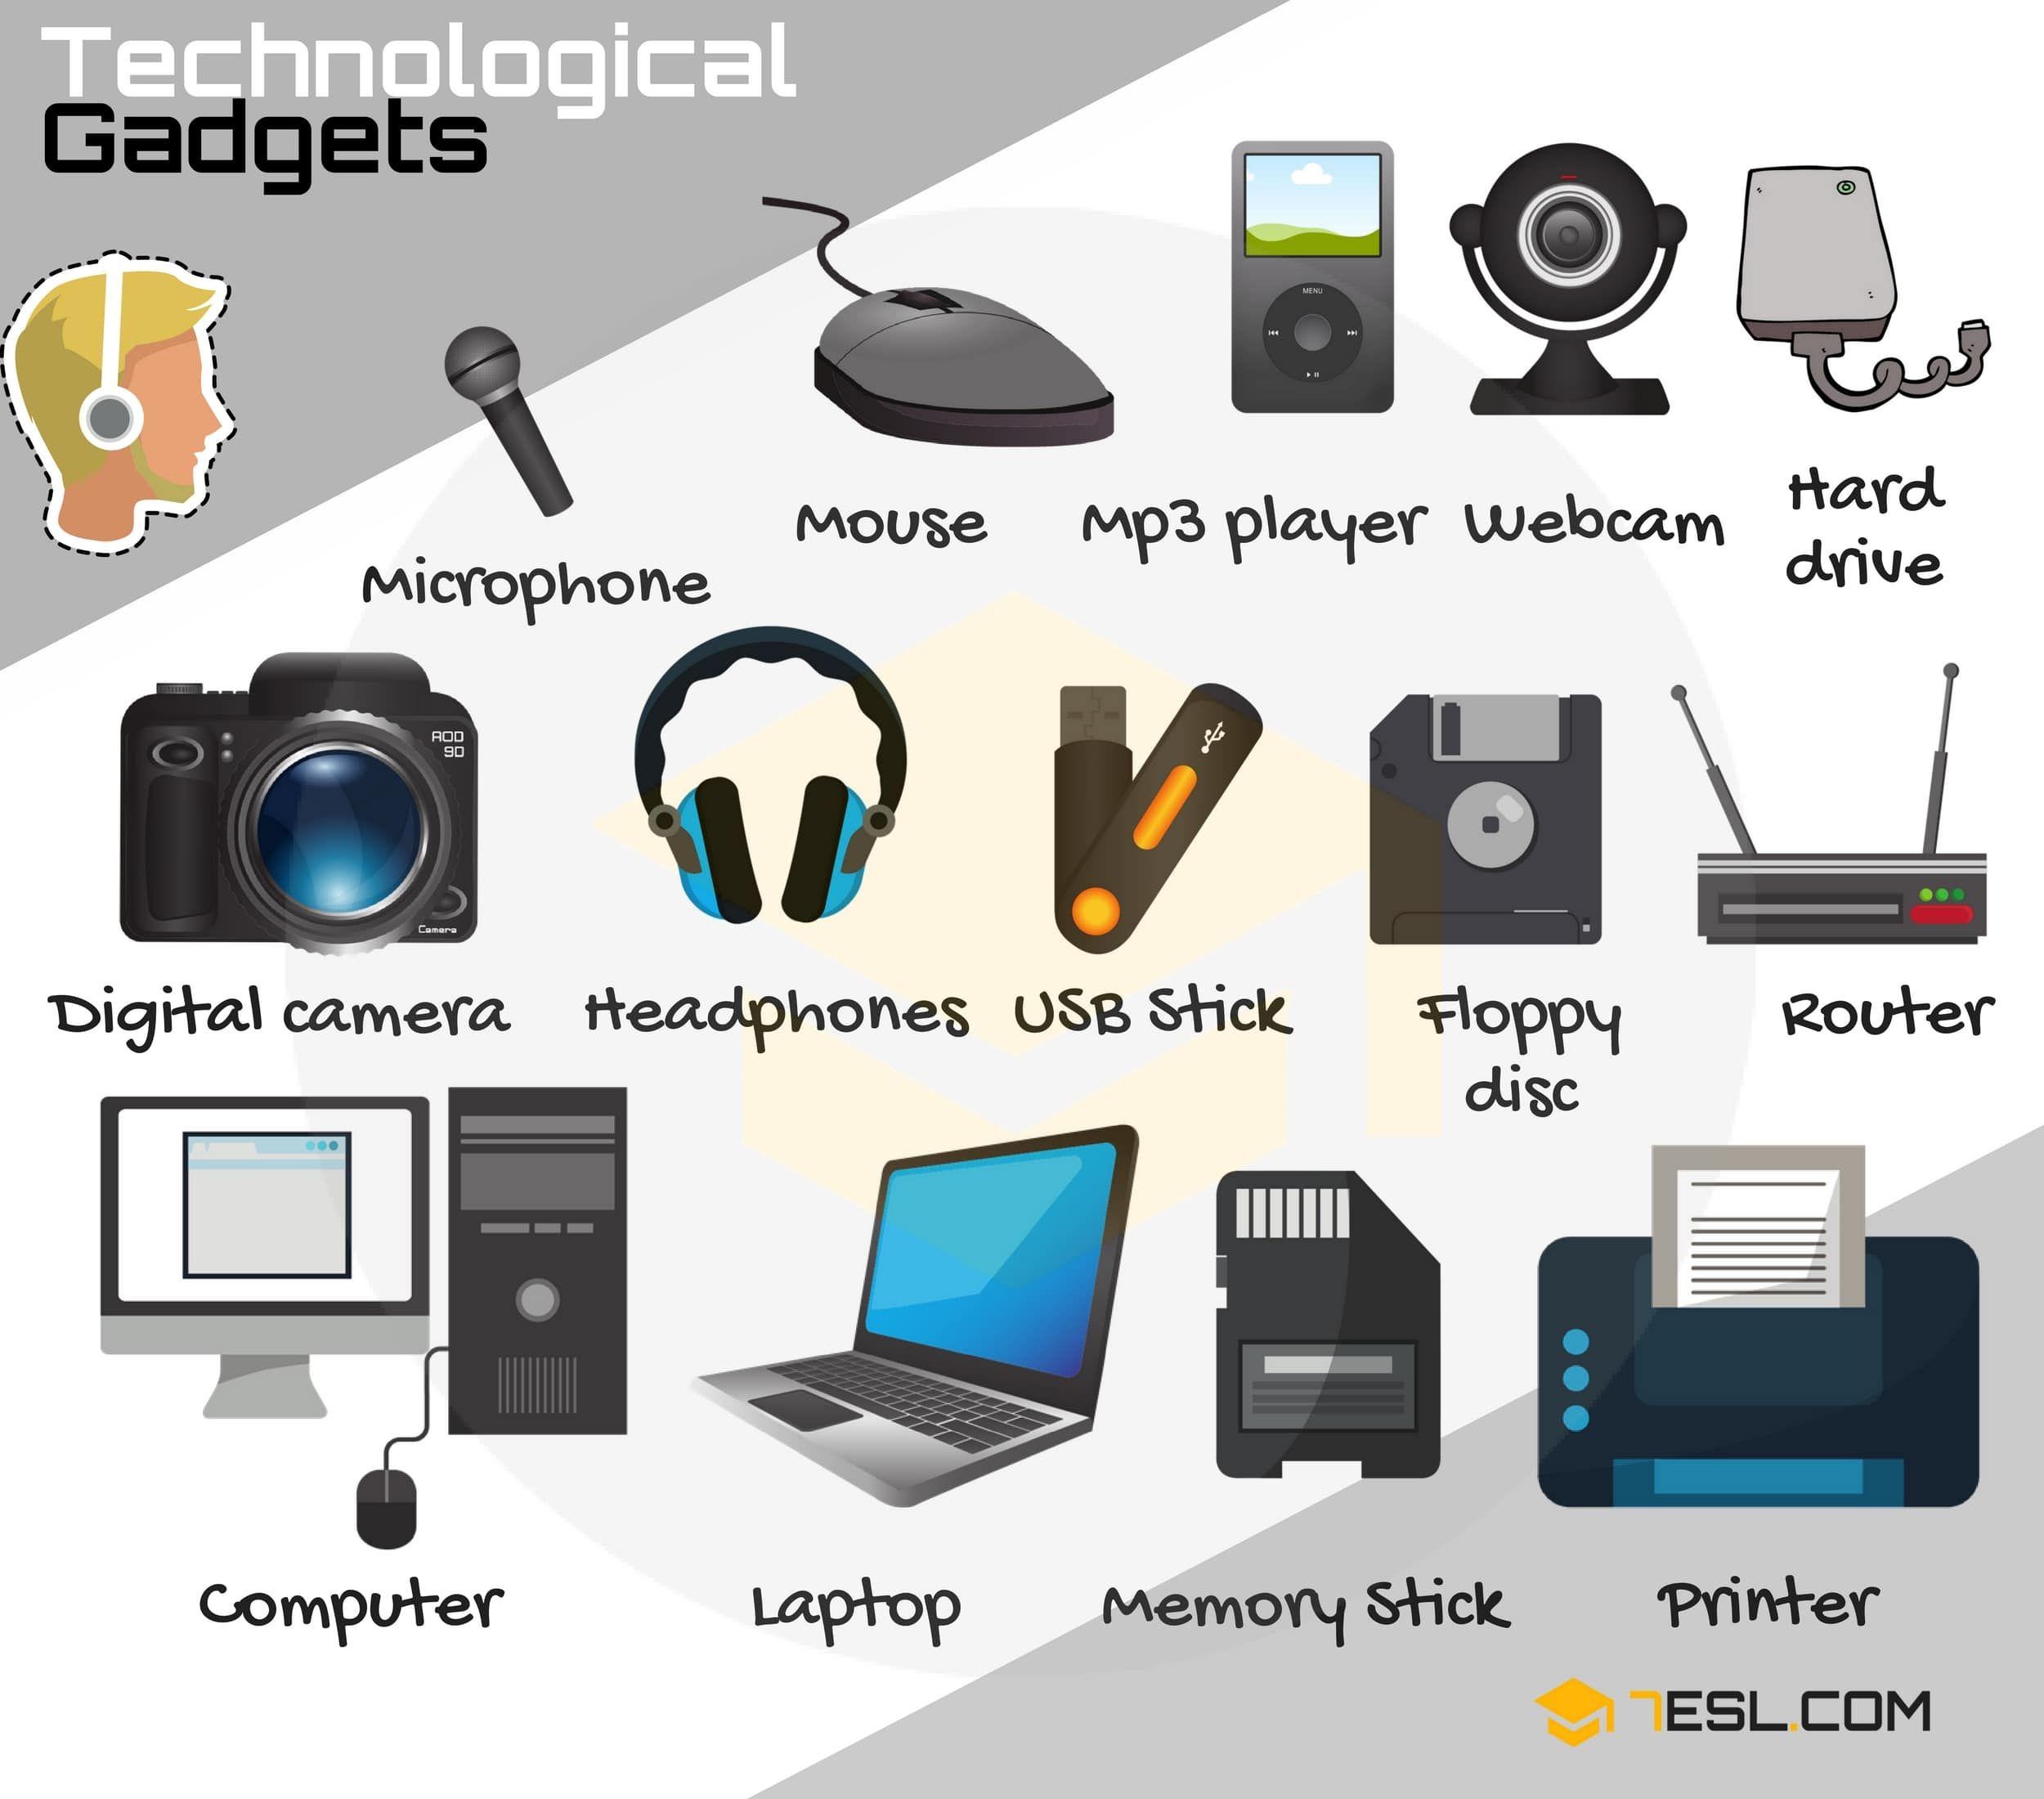 Technological Gadgets Vocabulary